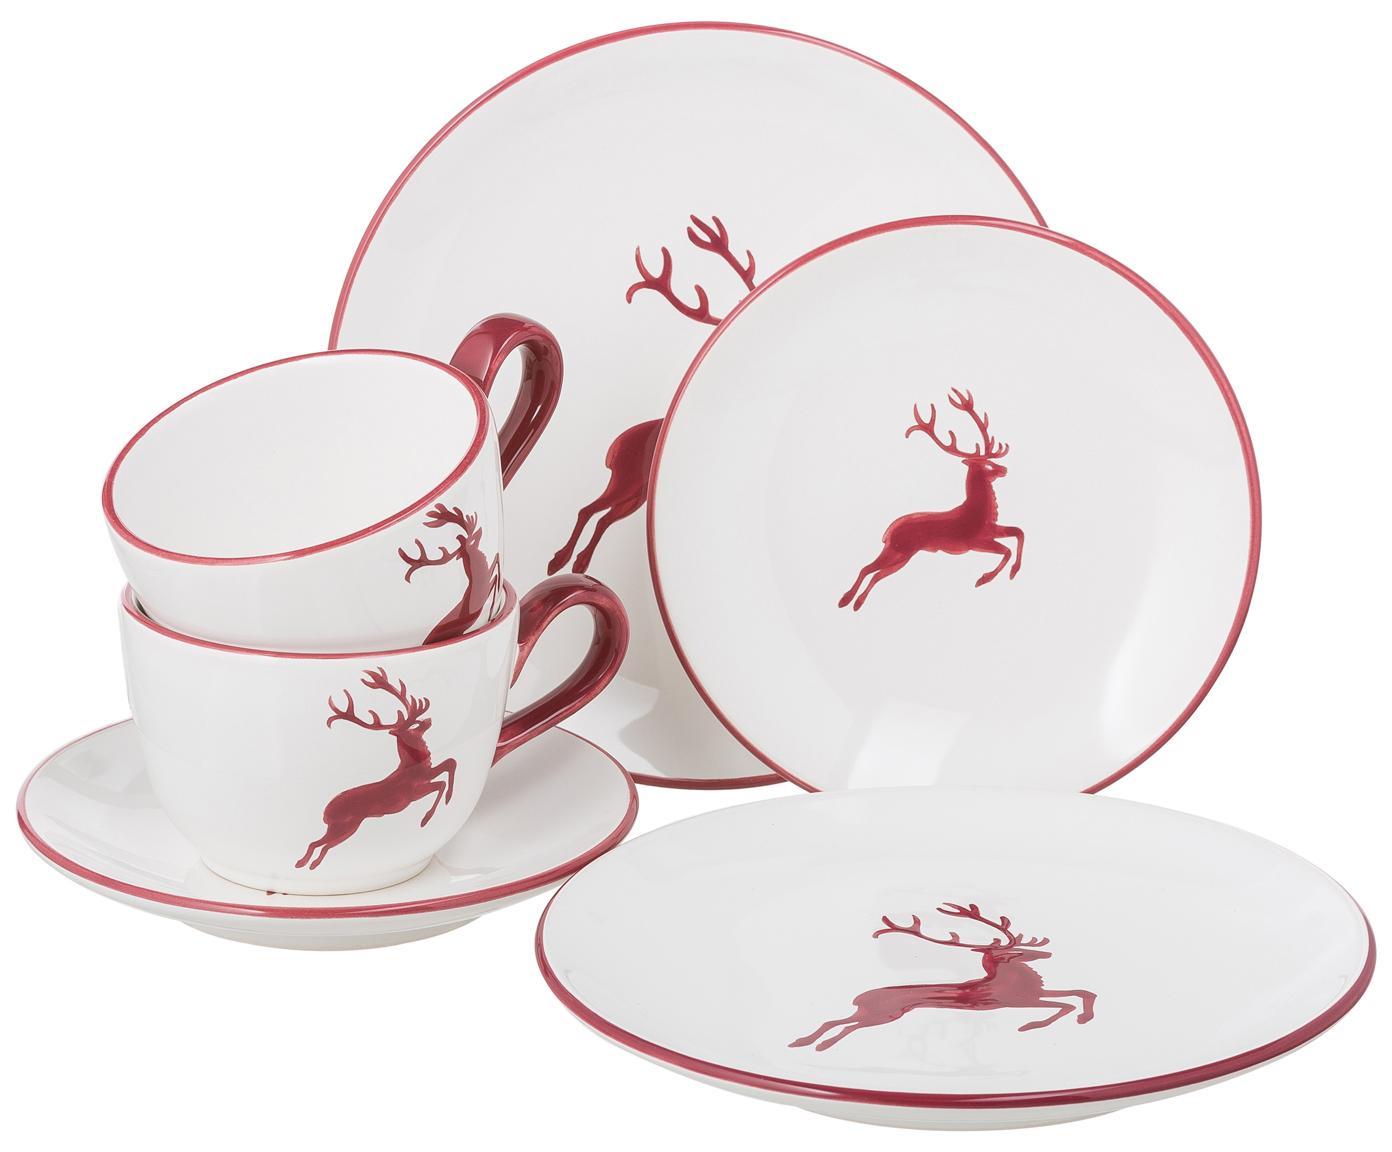 Set de café Classic Roter Hirsch, 2comensales (6pzas.), Cerámica, Blanco, rojo burdeos, Tamaños diferentes